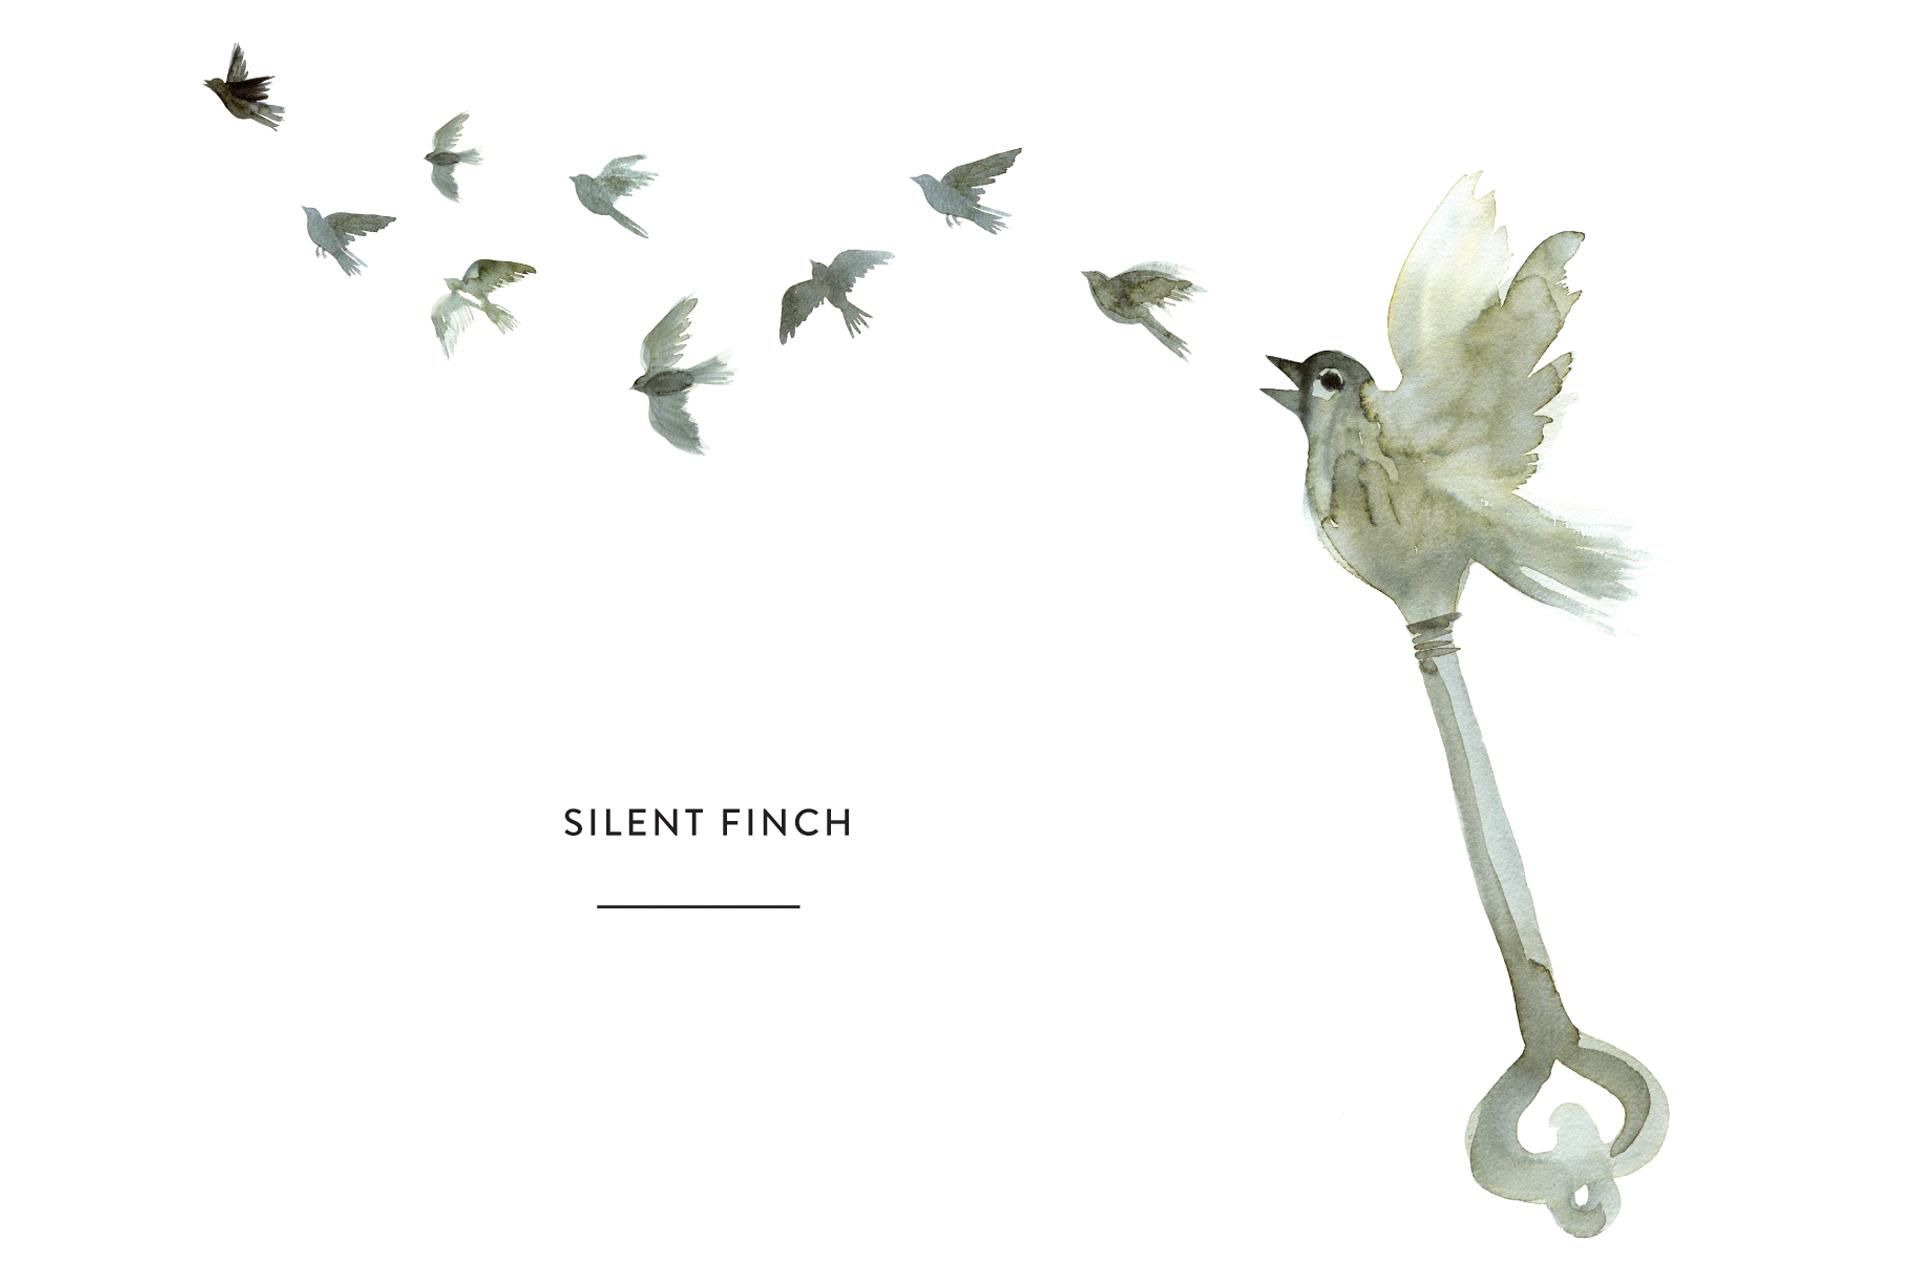 Silent Finch